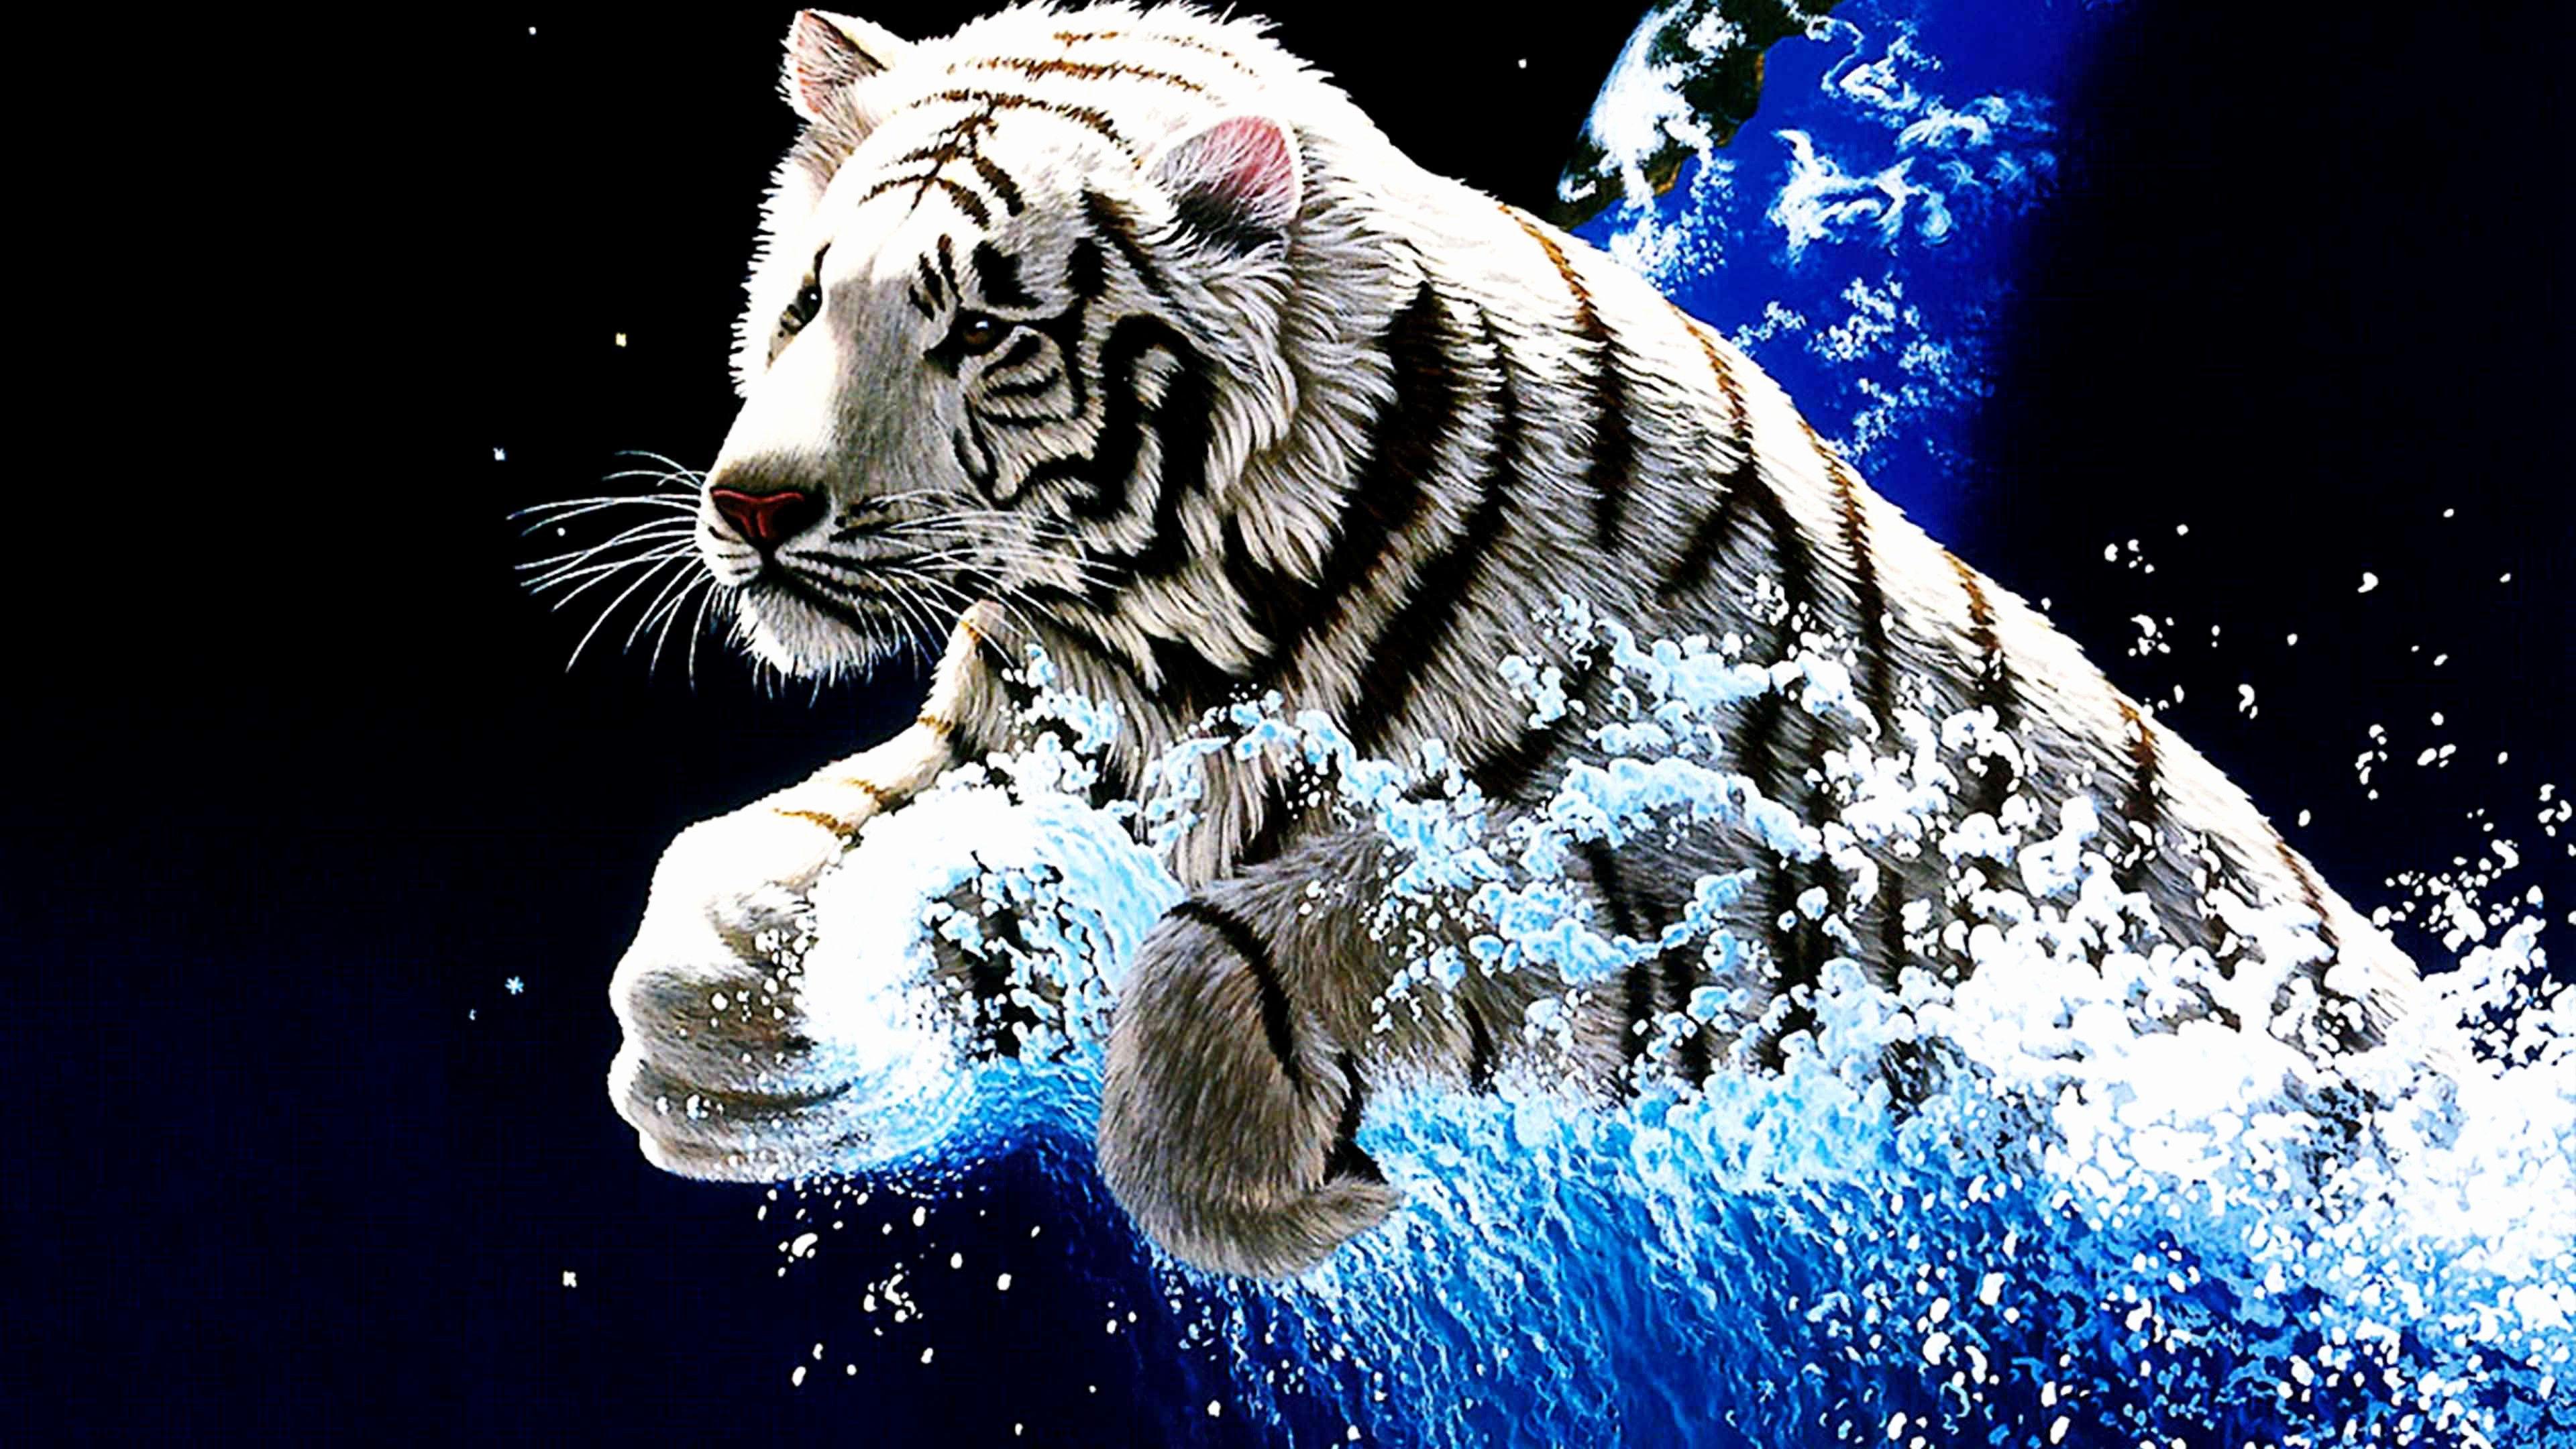 3d Animation Wallpaper Iphone Hd 1080p Tiger Tiger Wallpaper Tiger Pictures Animal Wallpaper